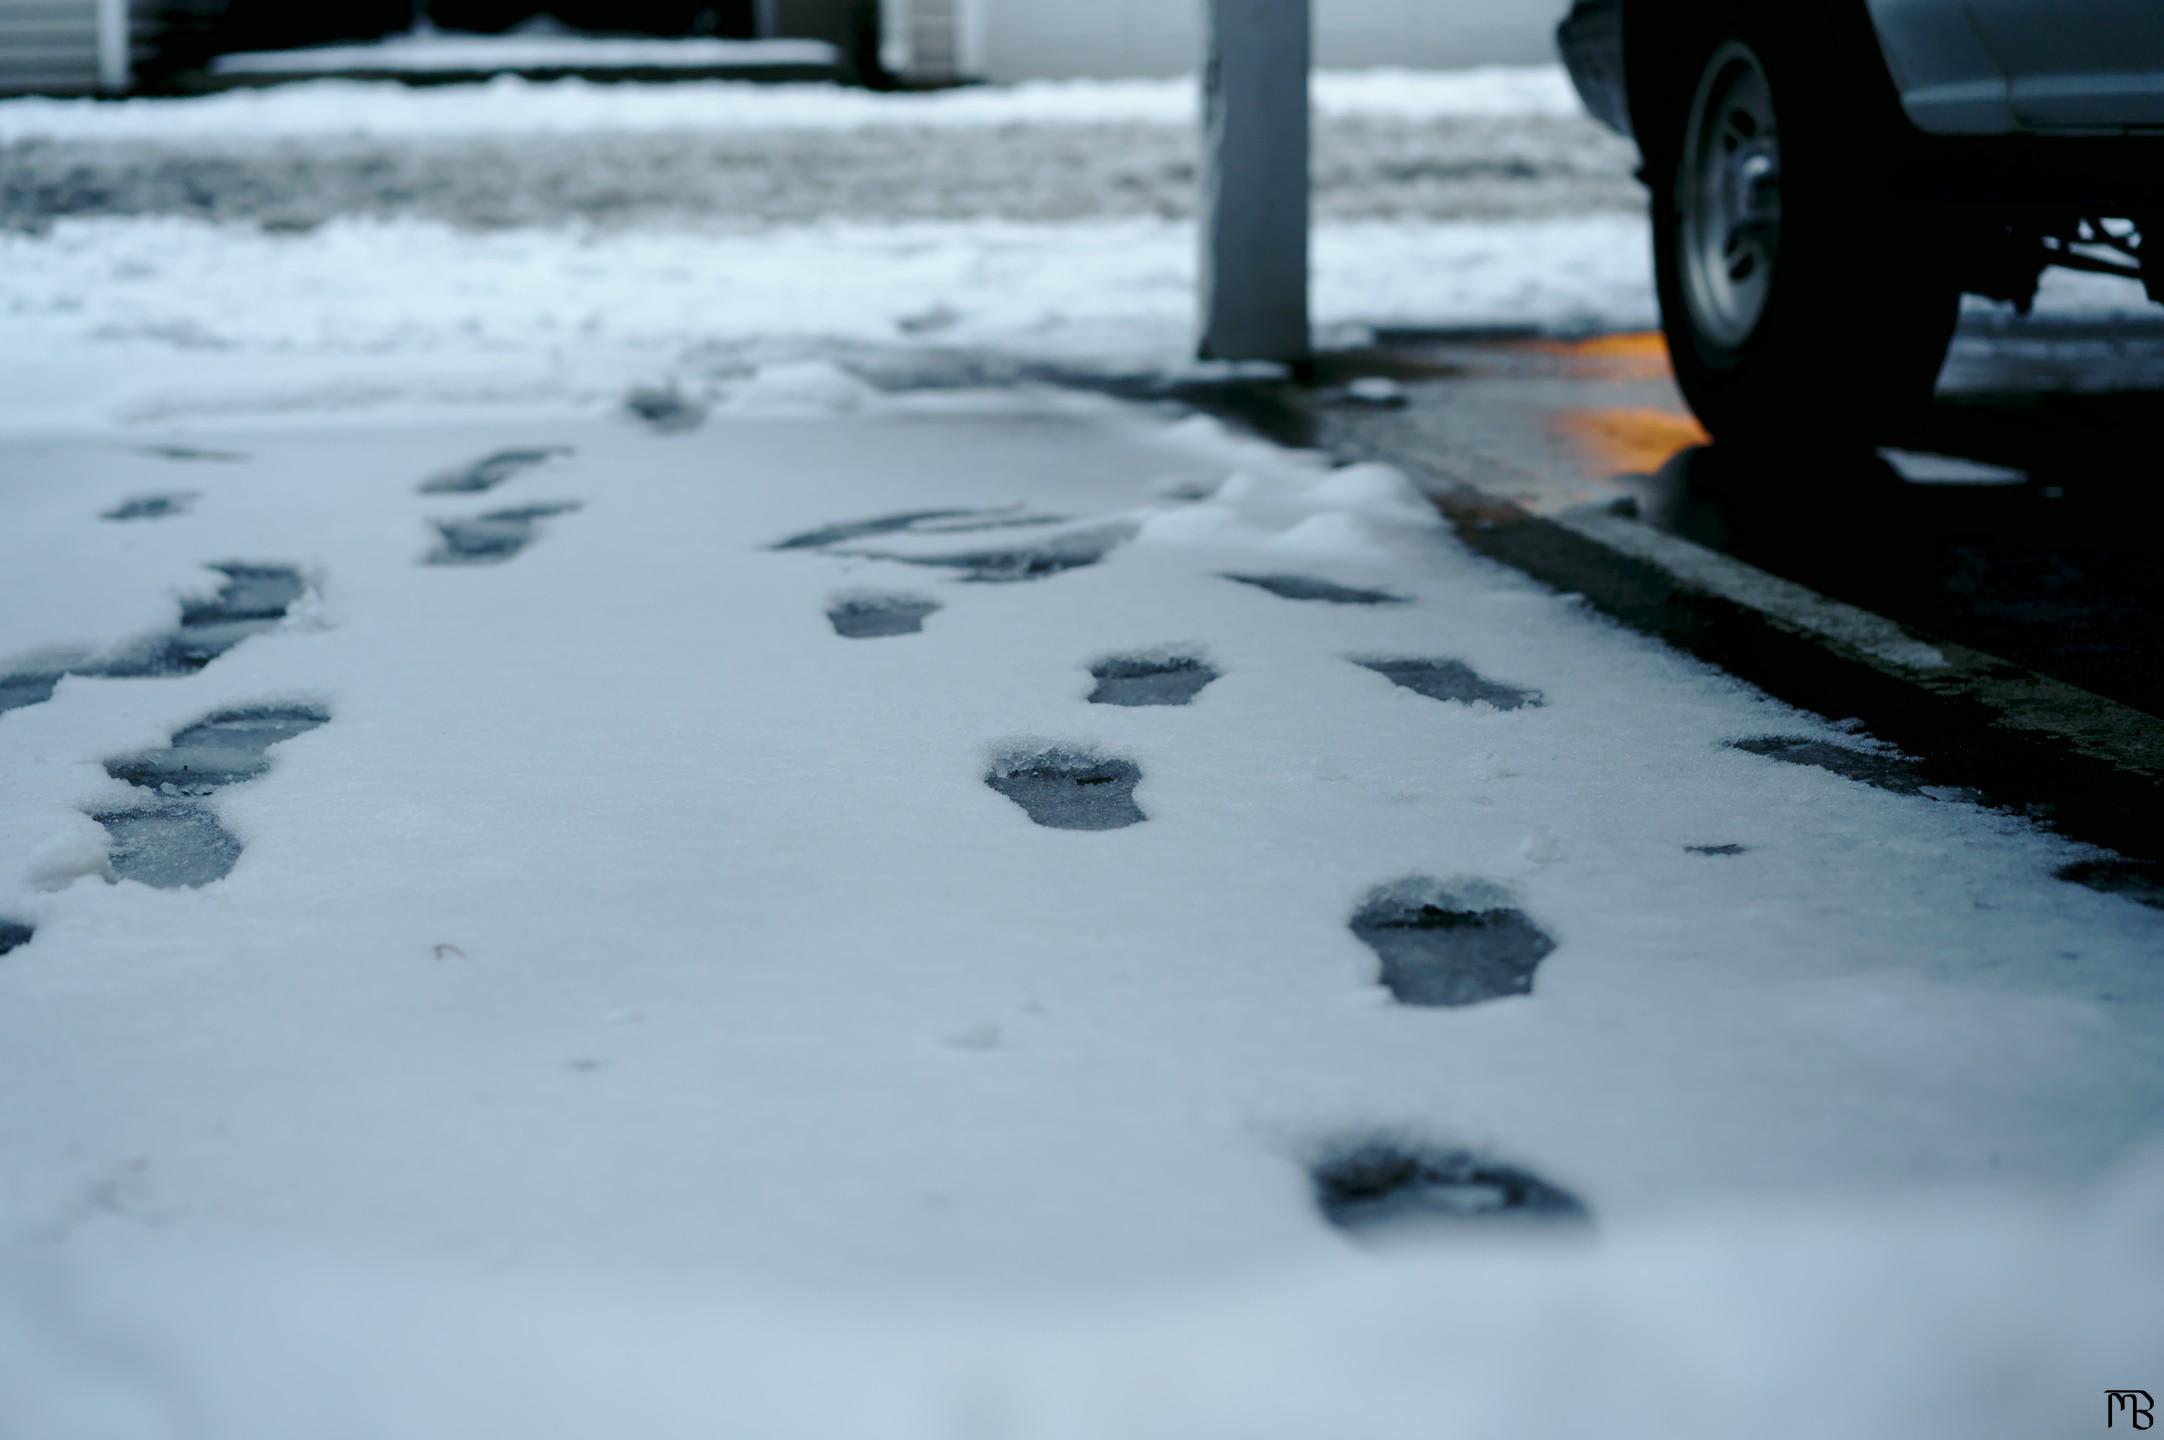 Steps in the snow near car